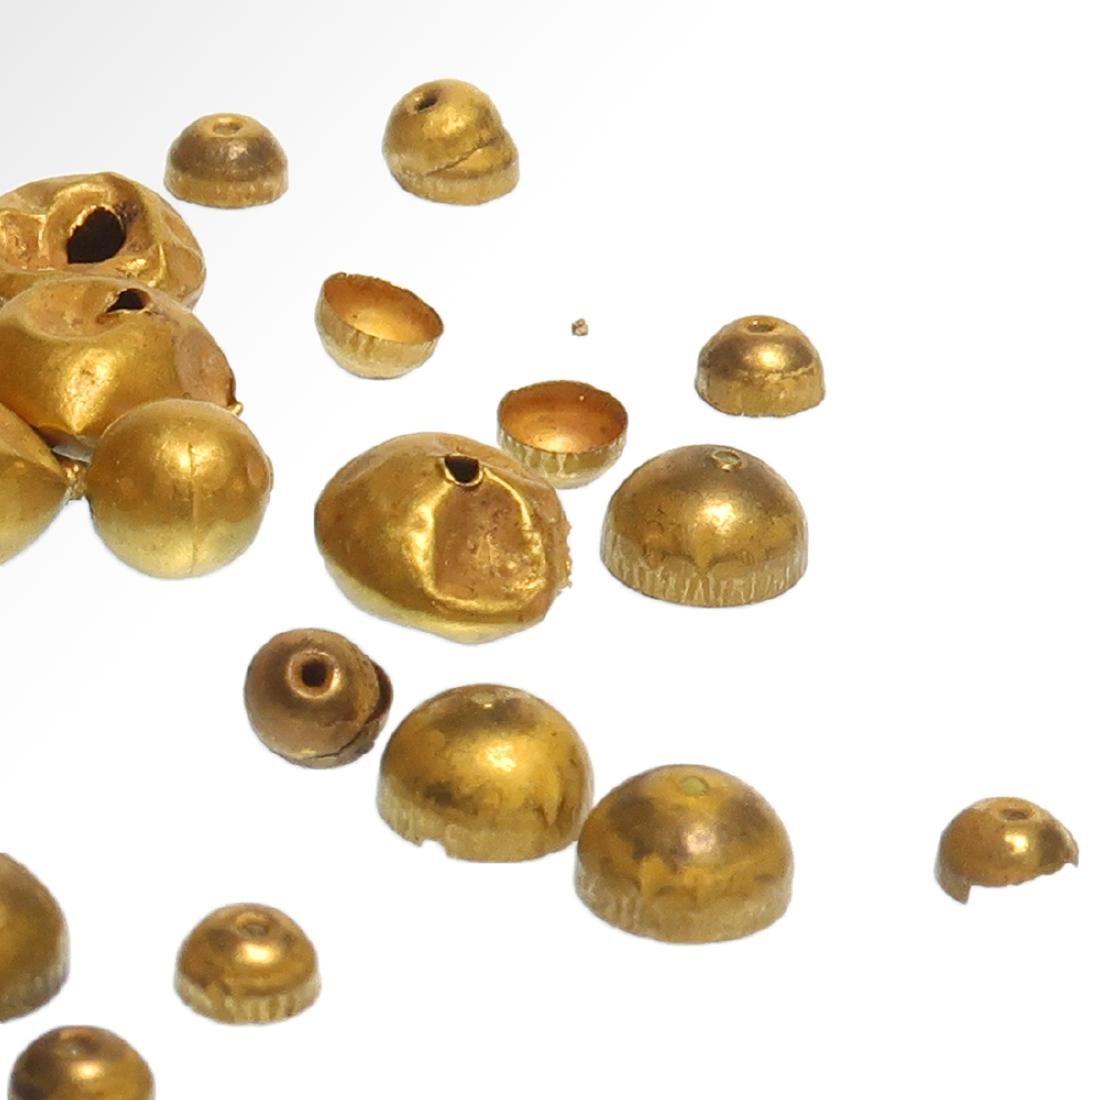 Forty-nine Roman Gold Beads, c. 1st Century A.D. - 6